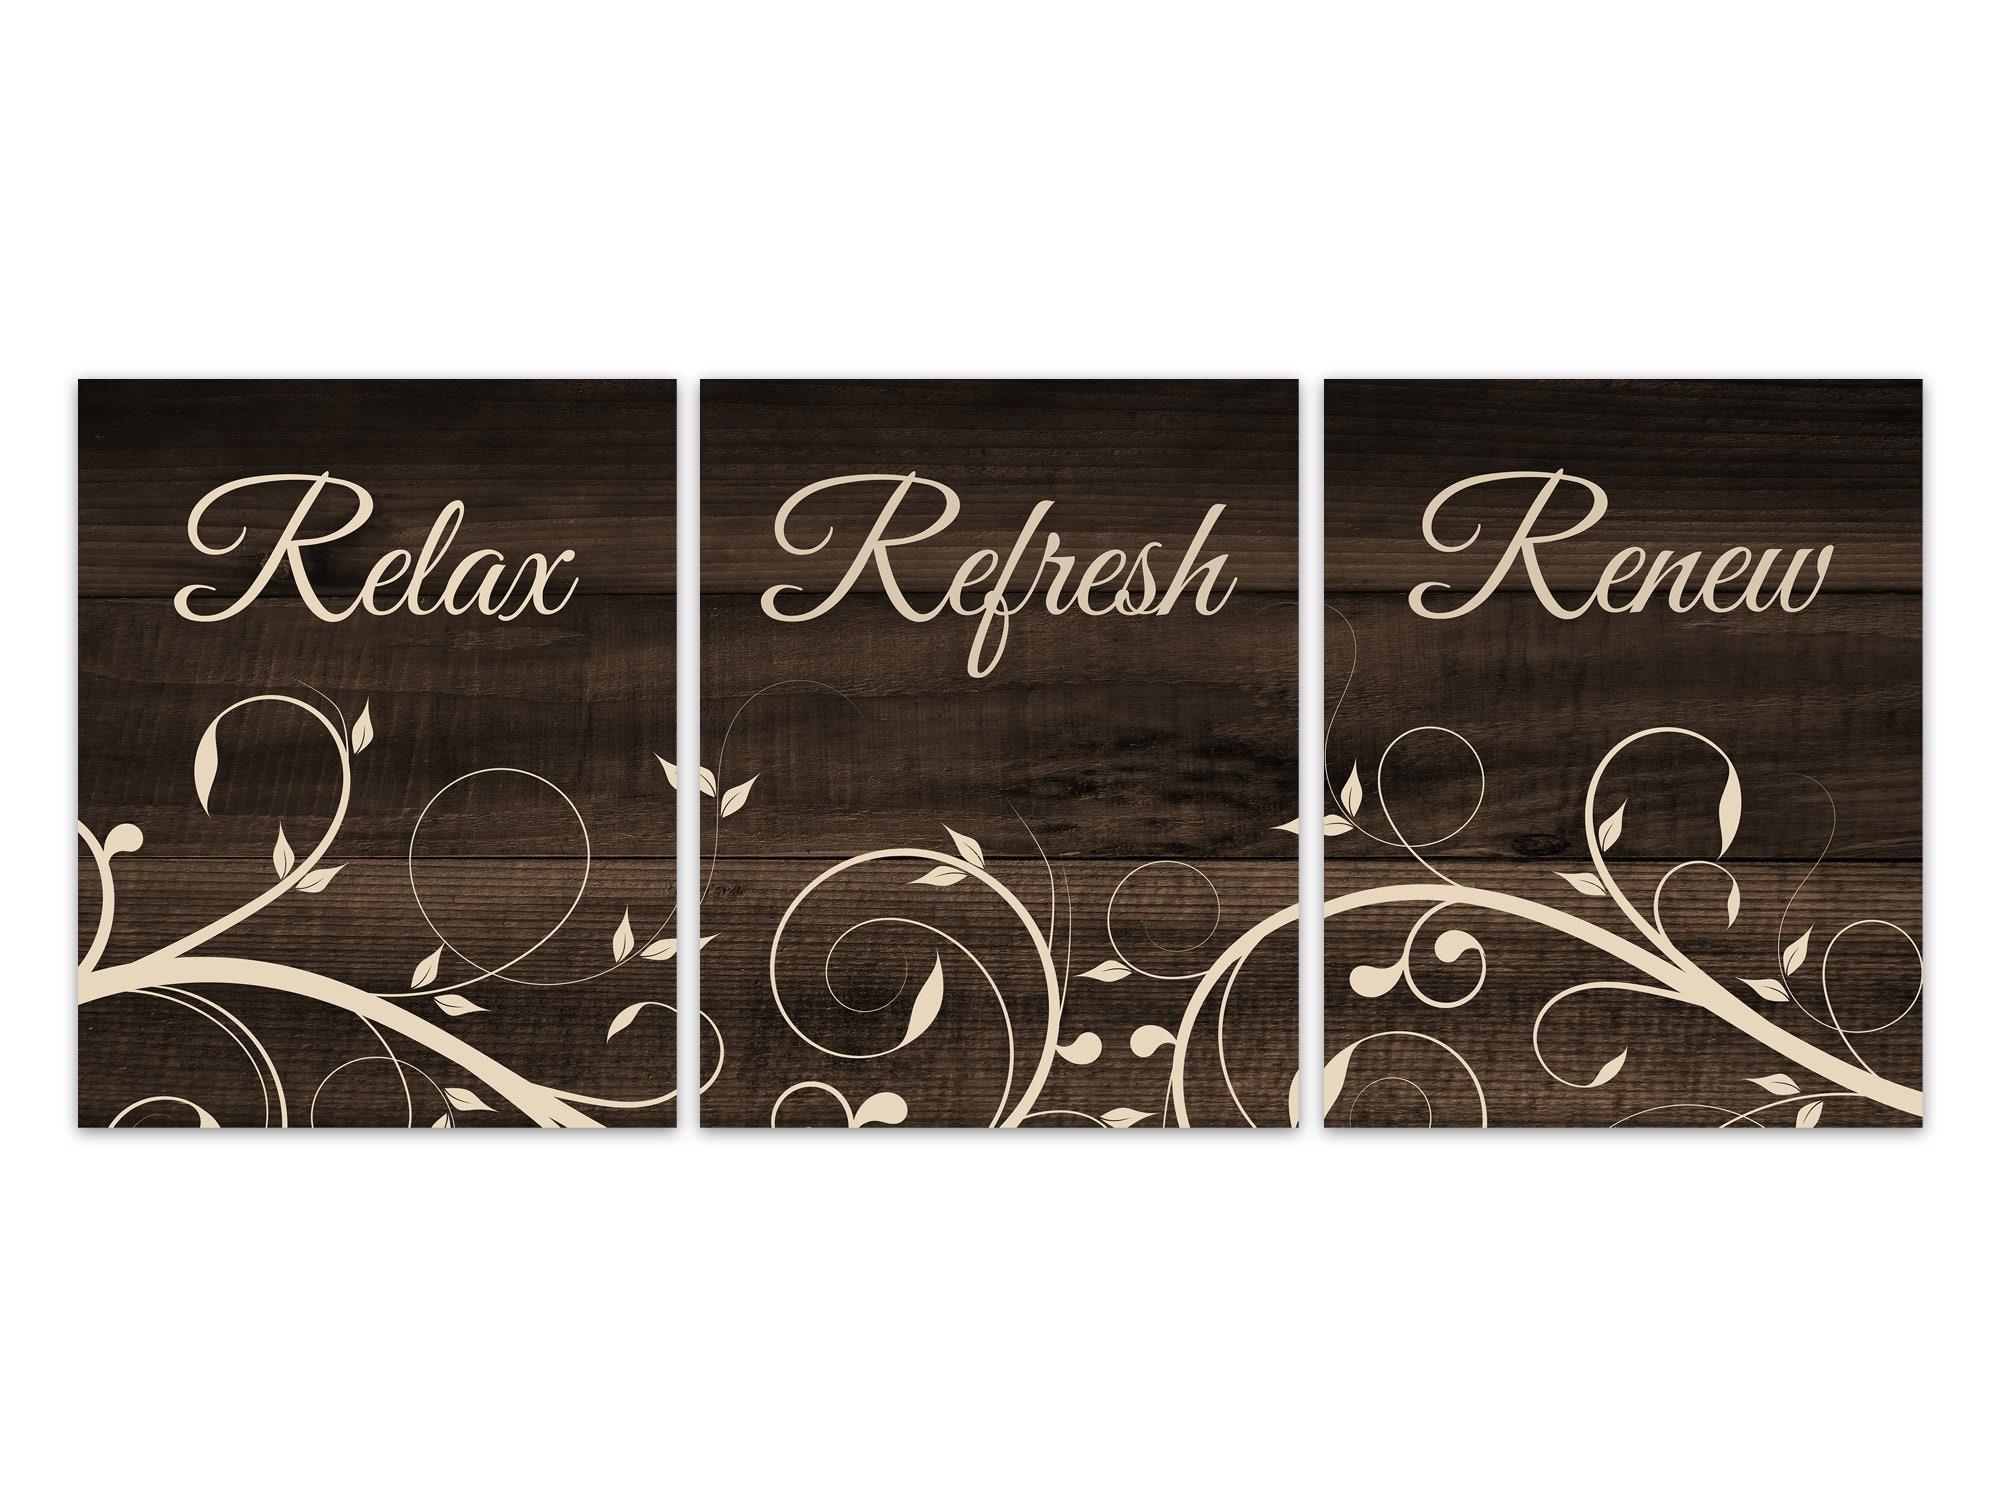 Brown Bathroom Decor, Relax Refresh Renew, Bedroom Art, Wood Effect Bath Art  PRINTS Or CANVAS, Set Of 3 Rustic Bathroom Decor   BATH276